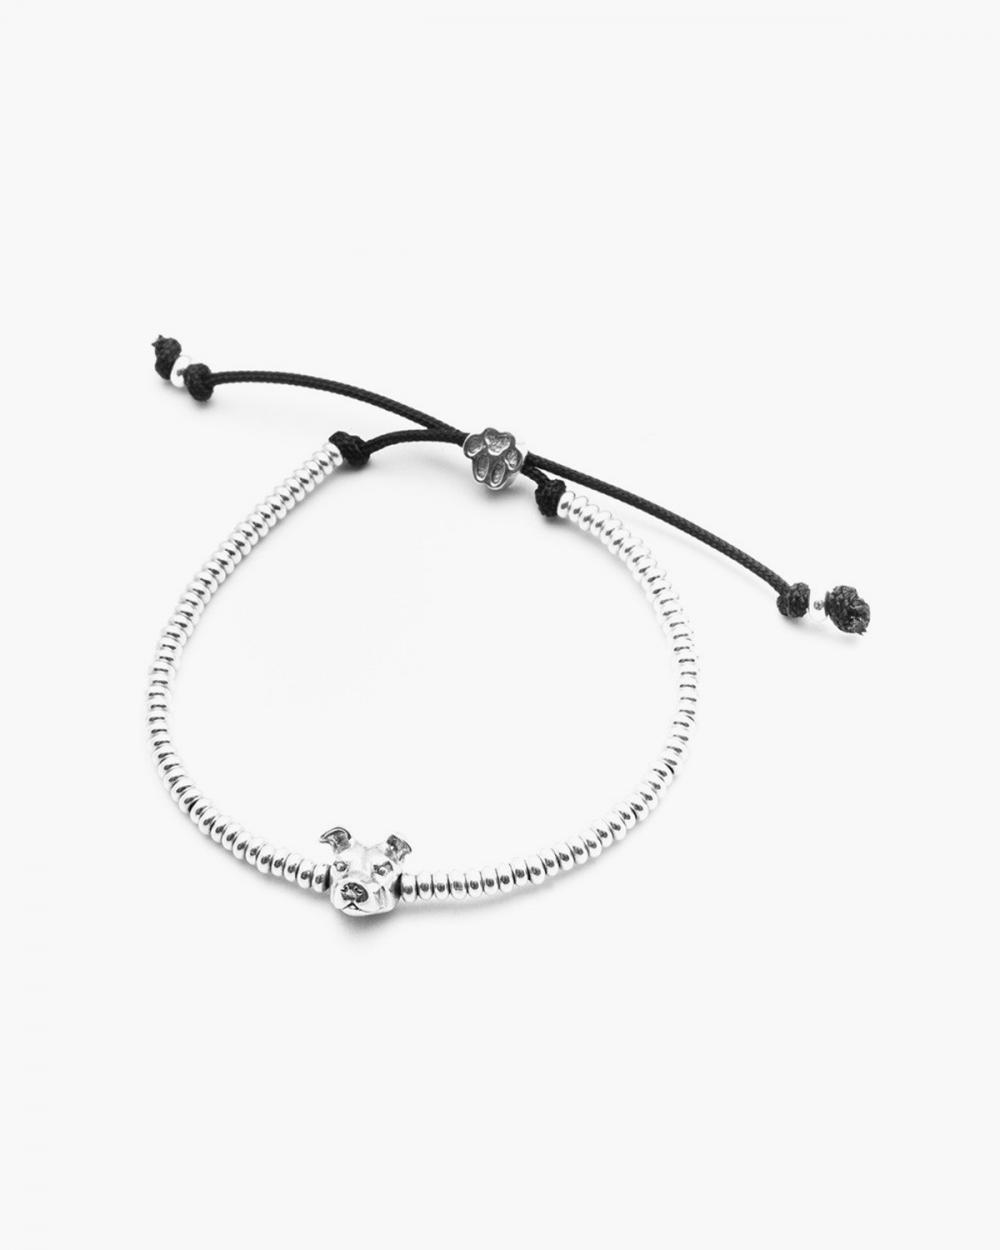 Bracelets AMERICAN STAFFORDSHIRE SNOUT BRACELET / POLISHED SILVER NOVE25